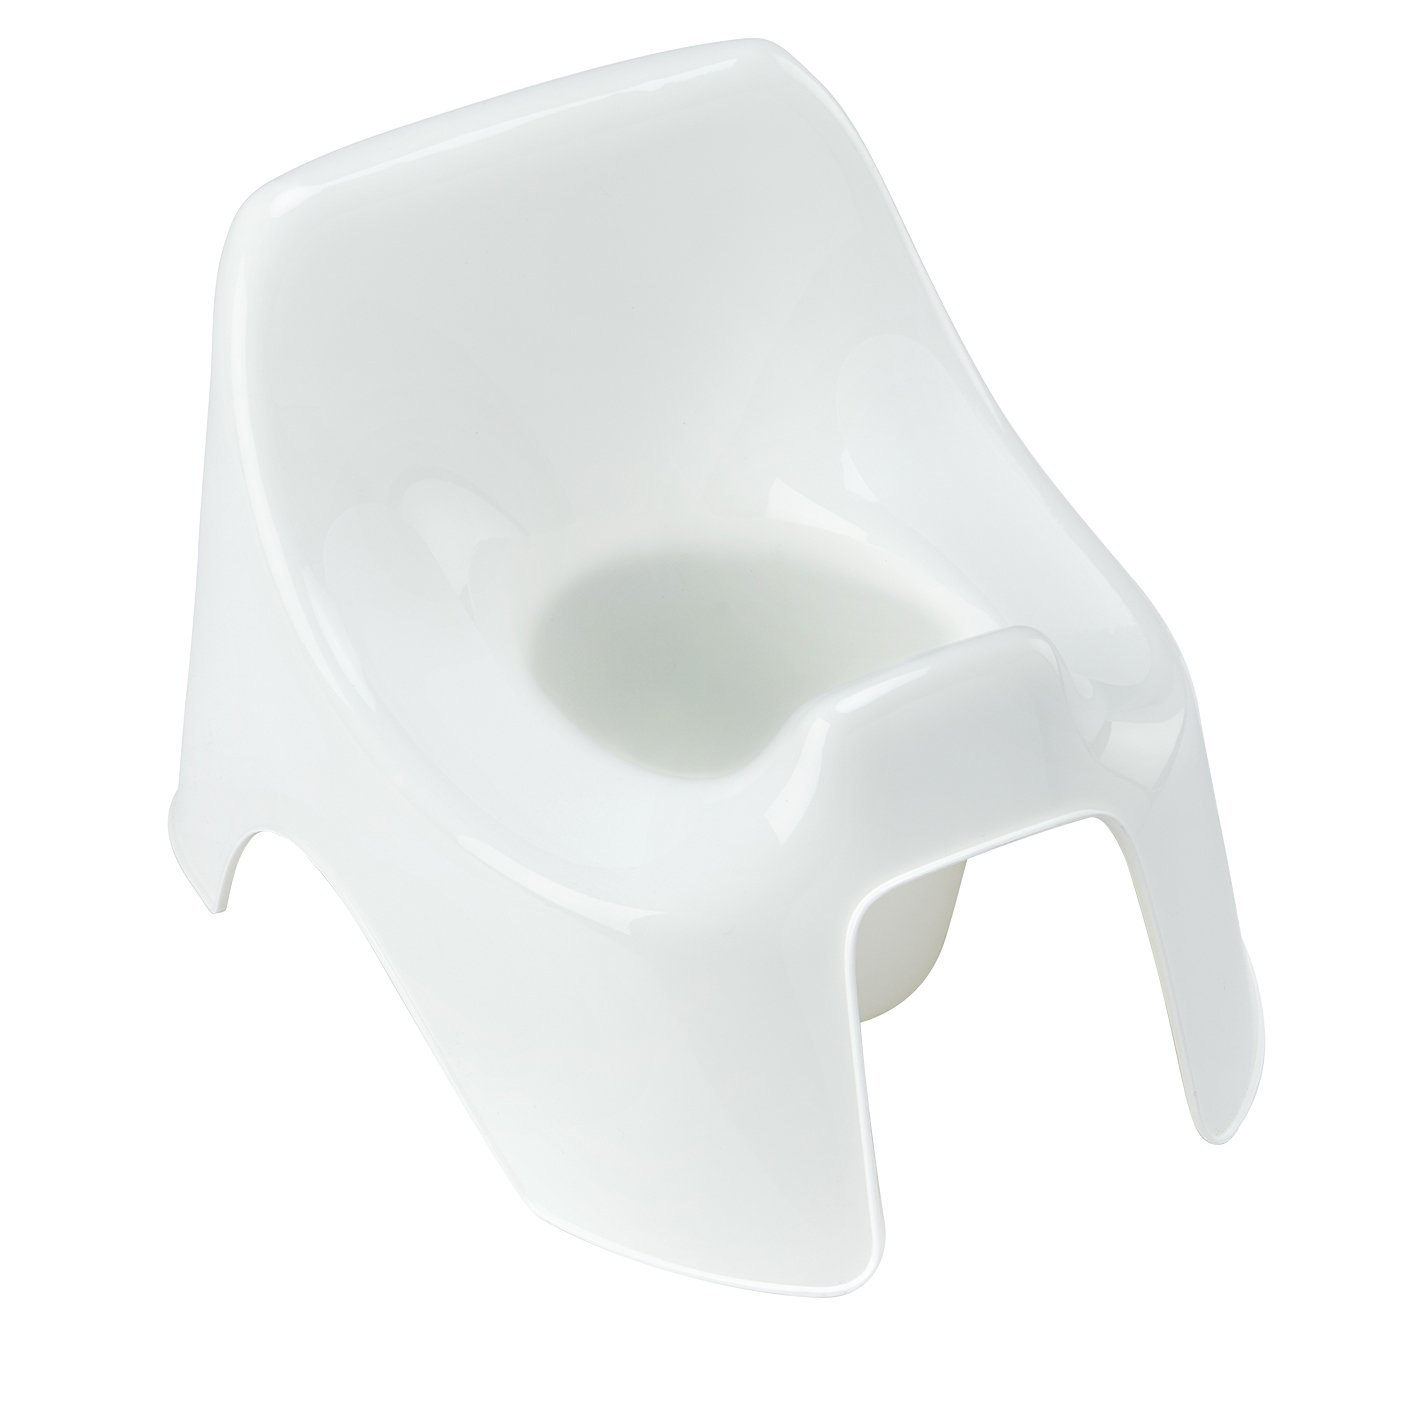 THERMOBABY Vase Anatomique Blanc Muguet